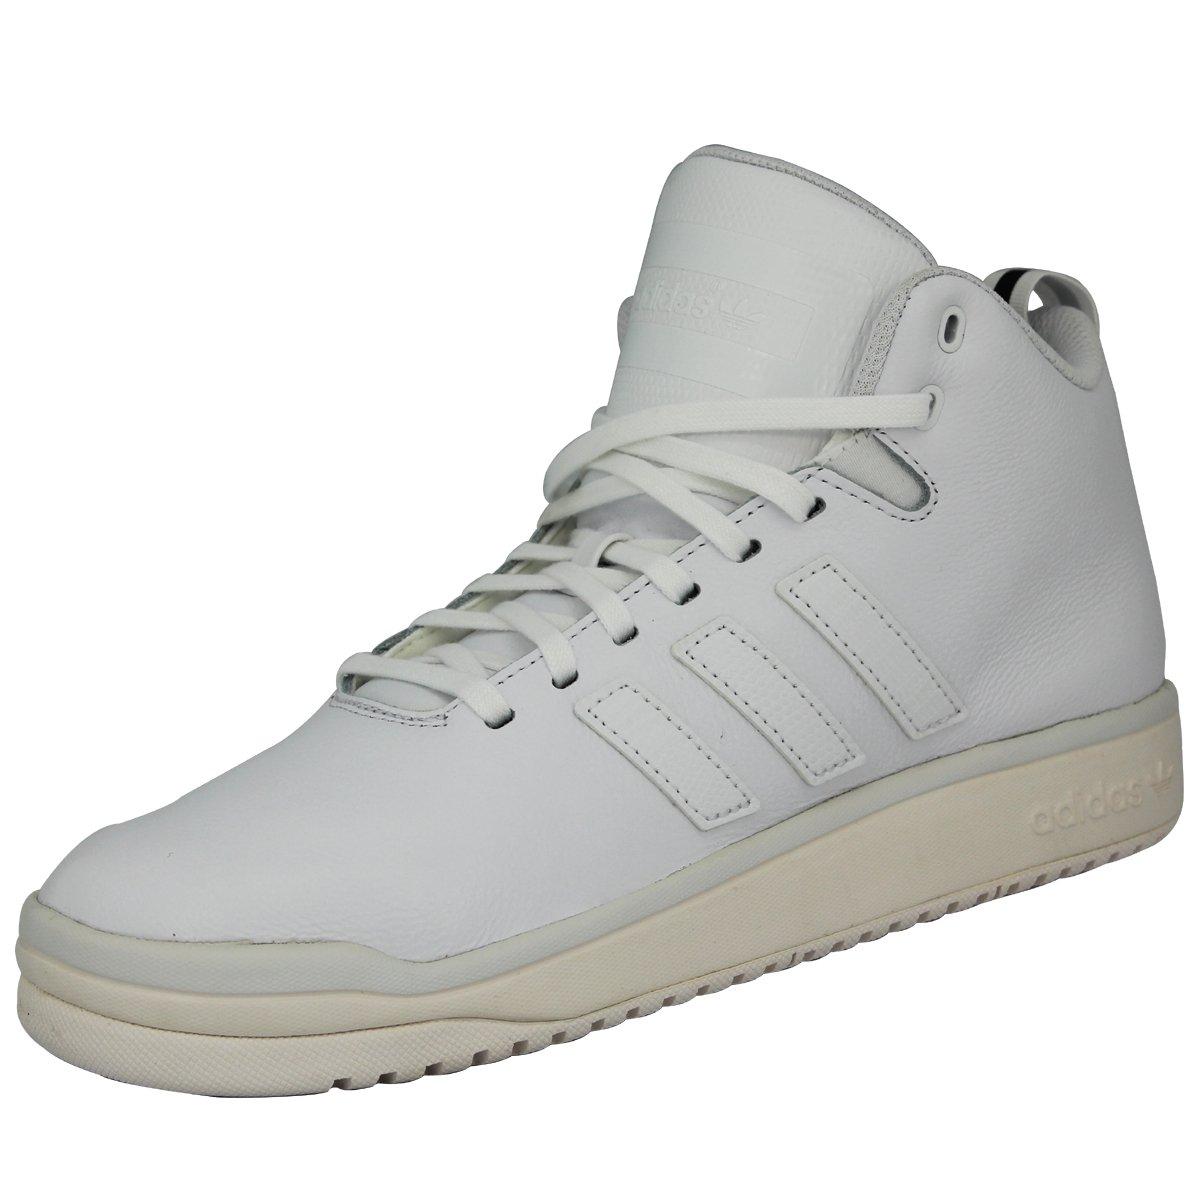 Sneaker Neueste adidas Originals VERITAS Sneaker weiß